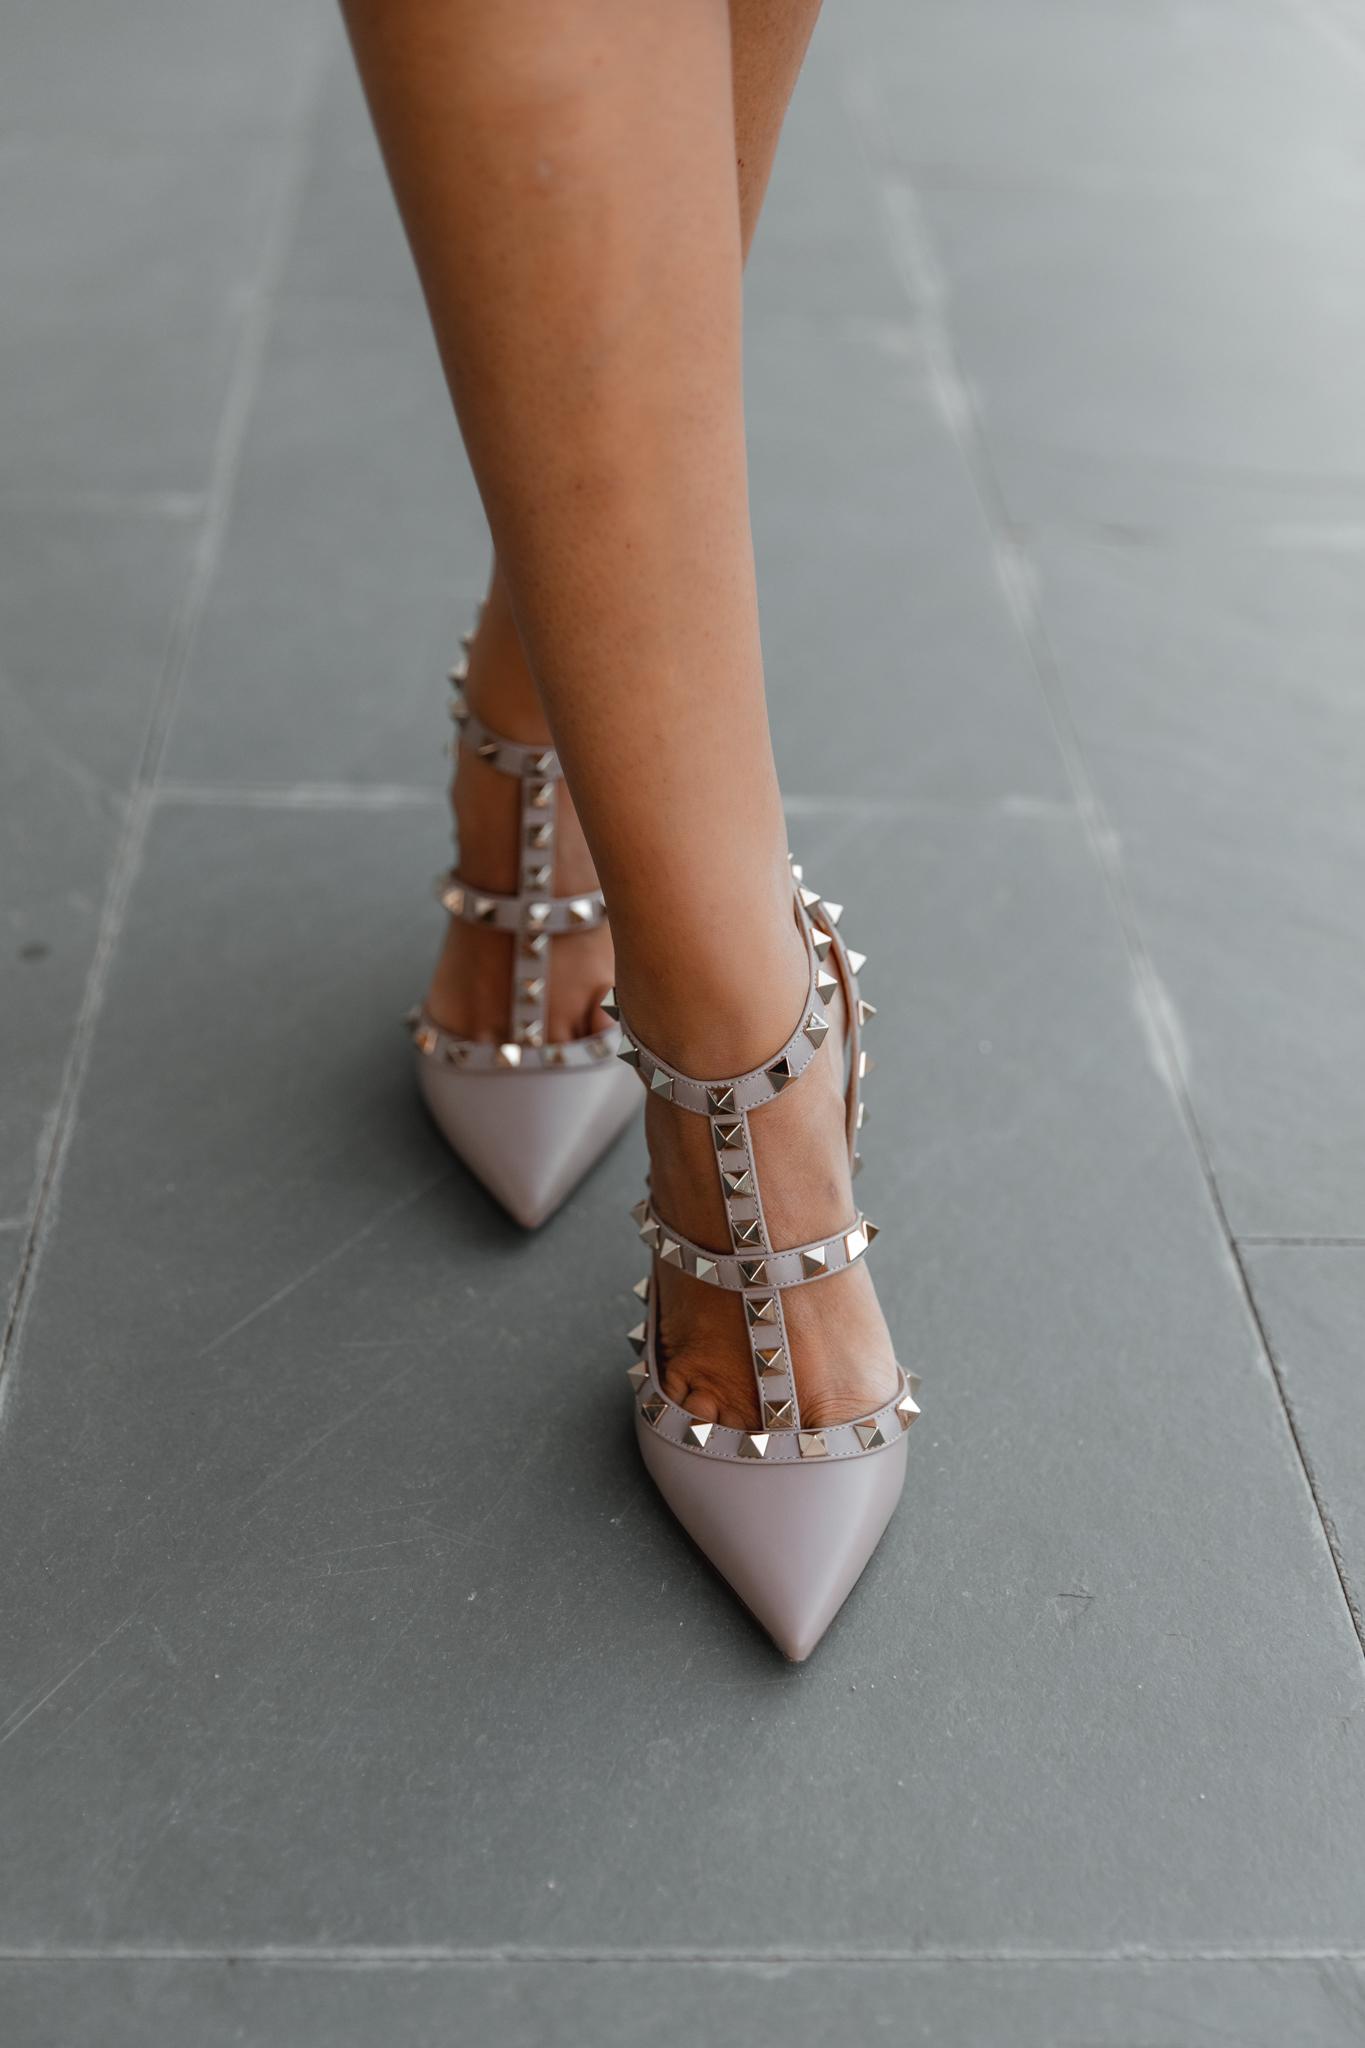 zapatos nude valentino invitada novia